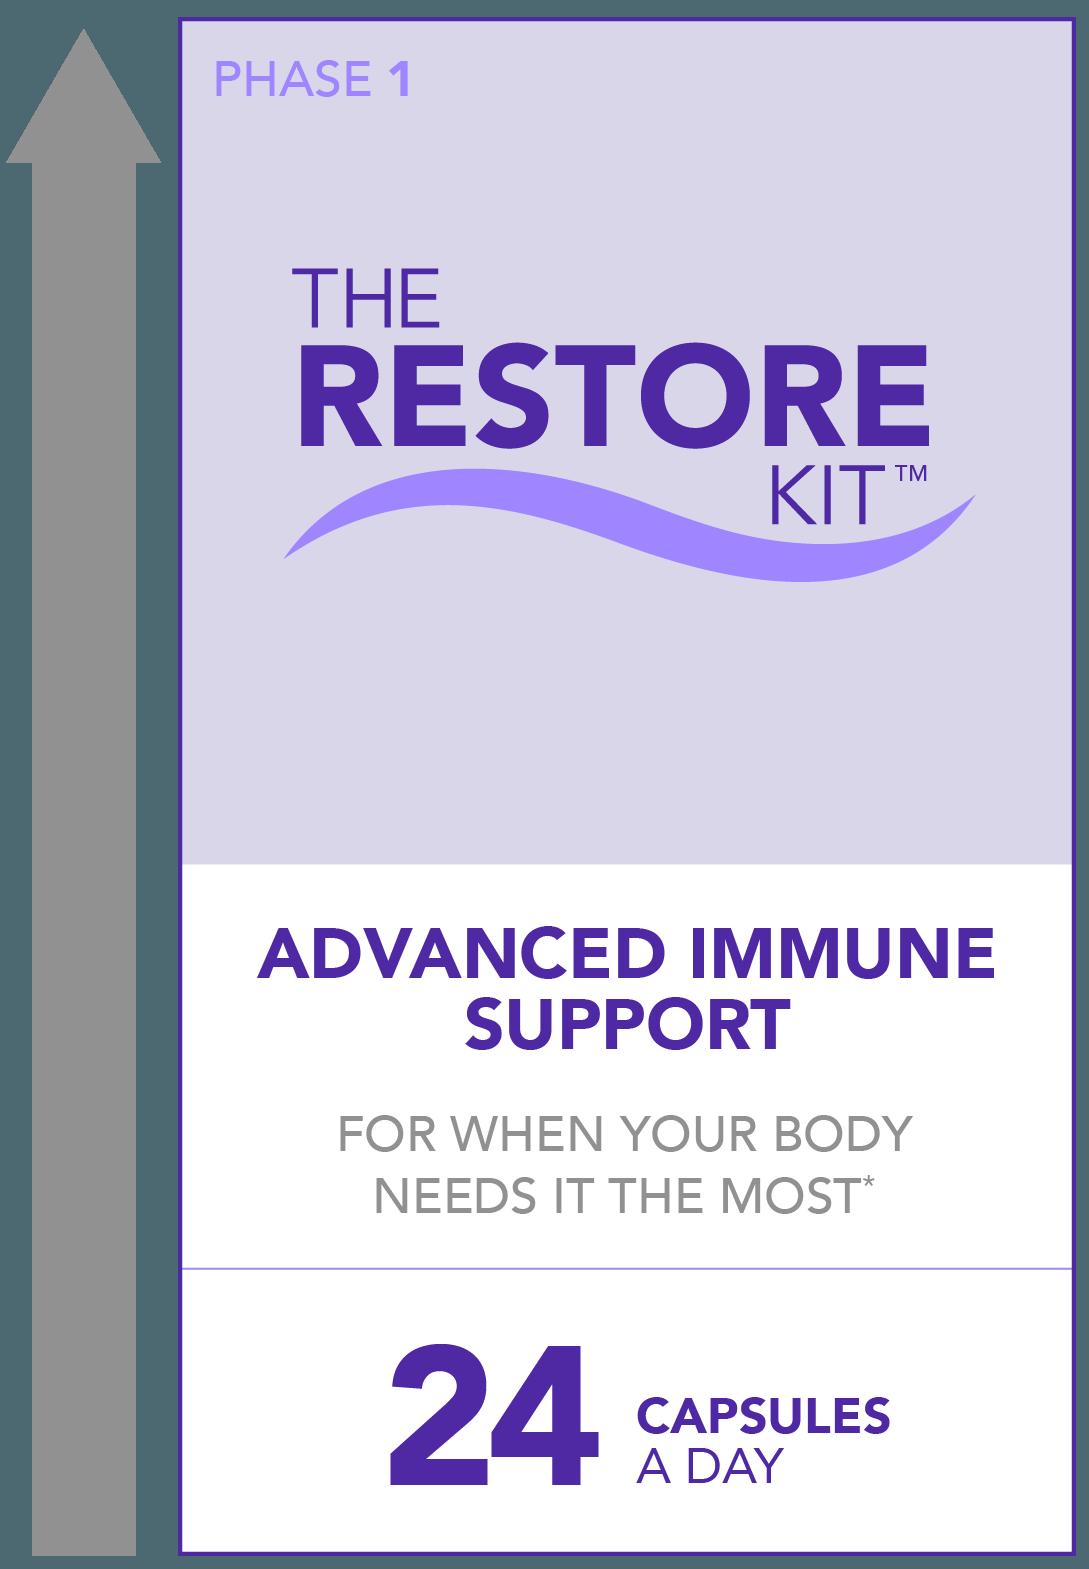 Daily Immunity Kit Dr Bill Rawls Immune Vitality Protocol